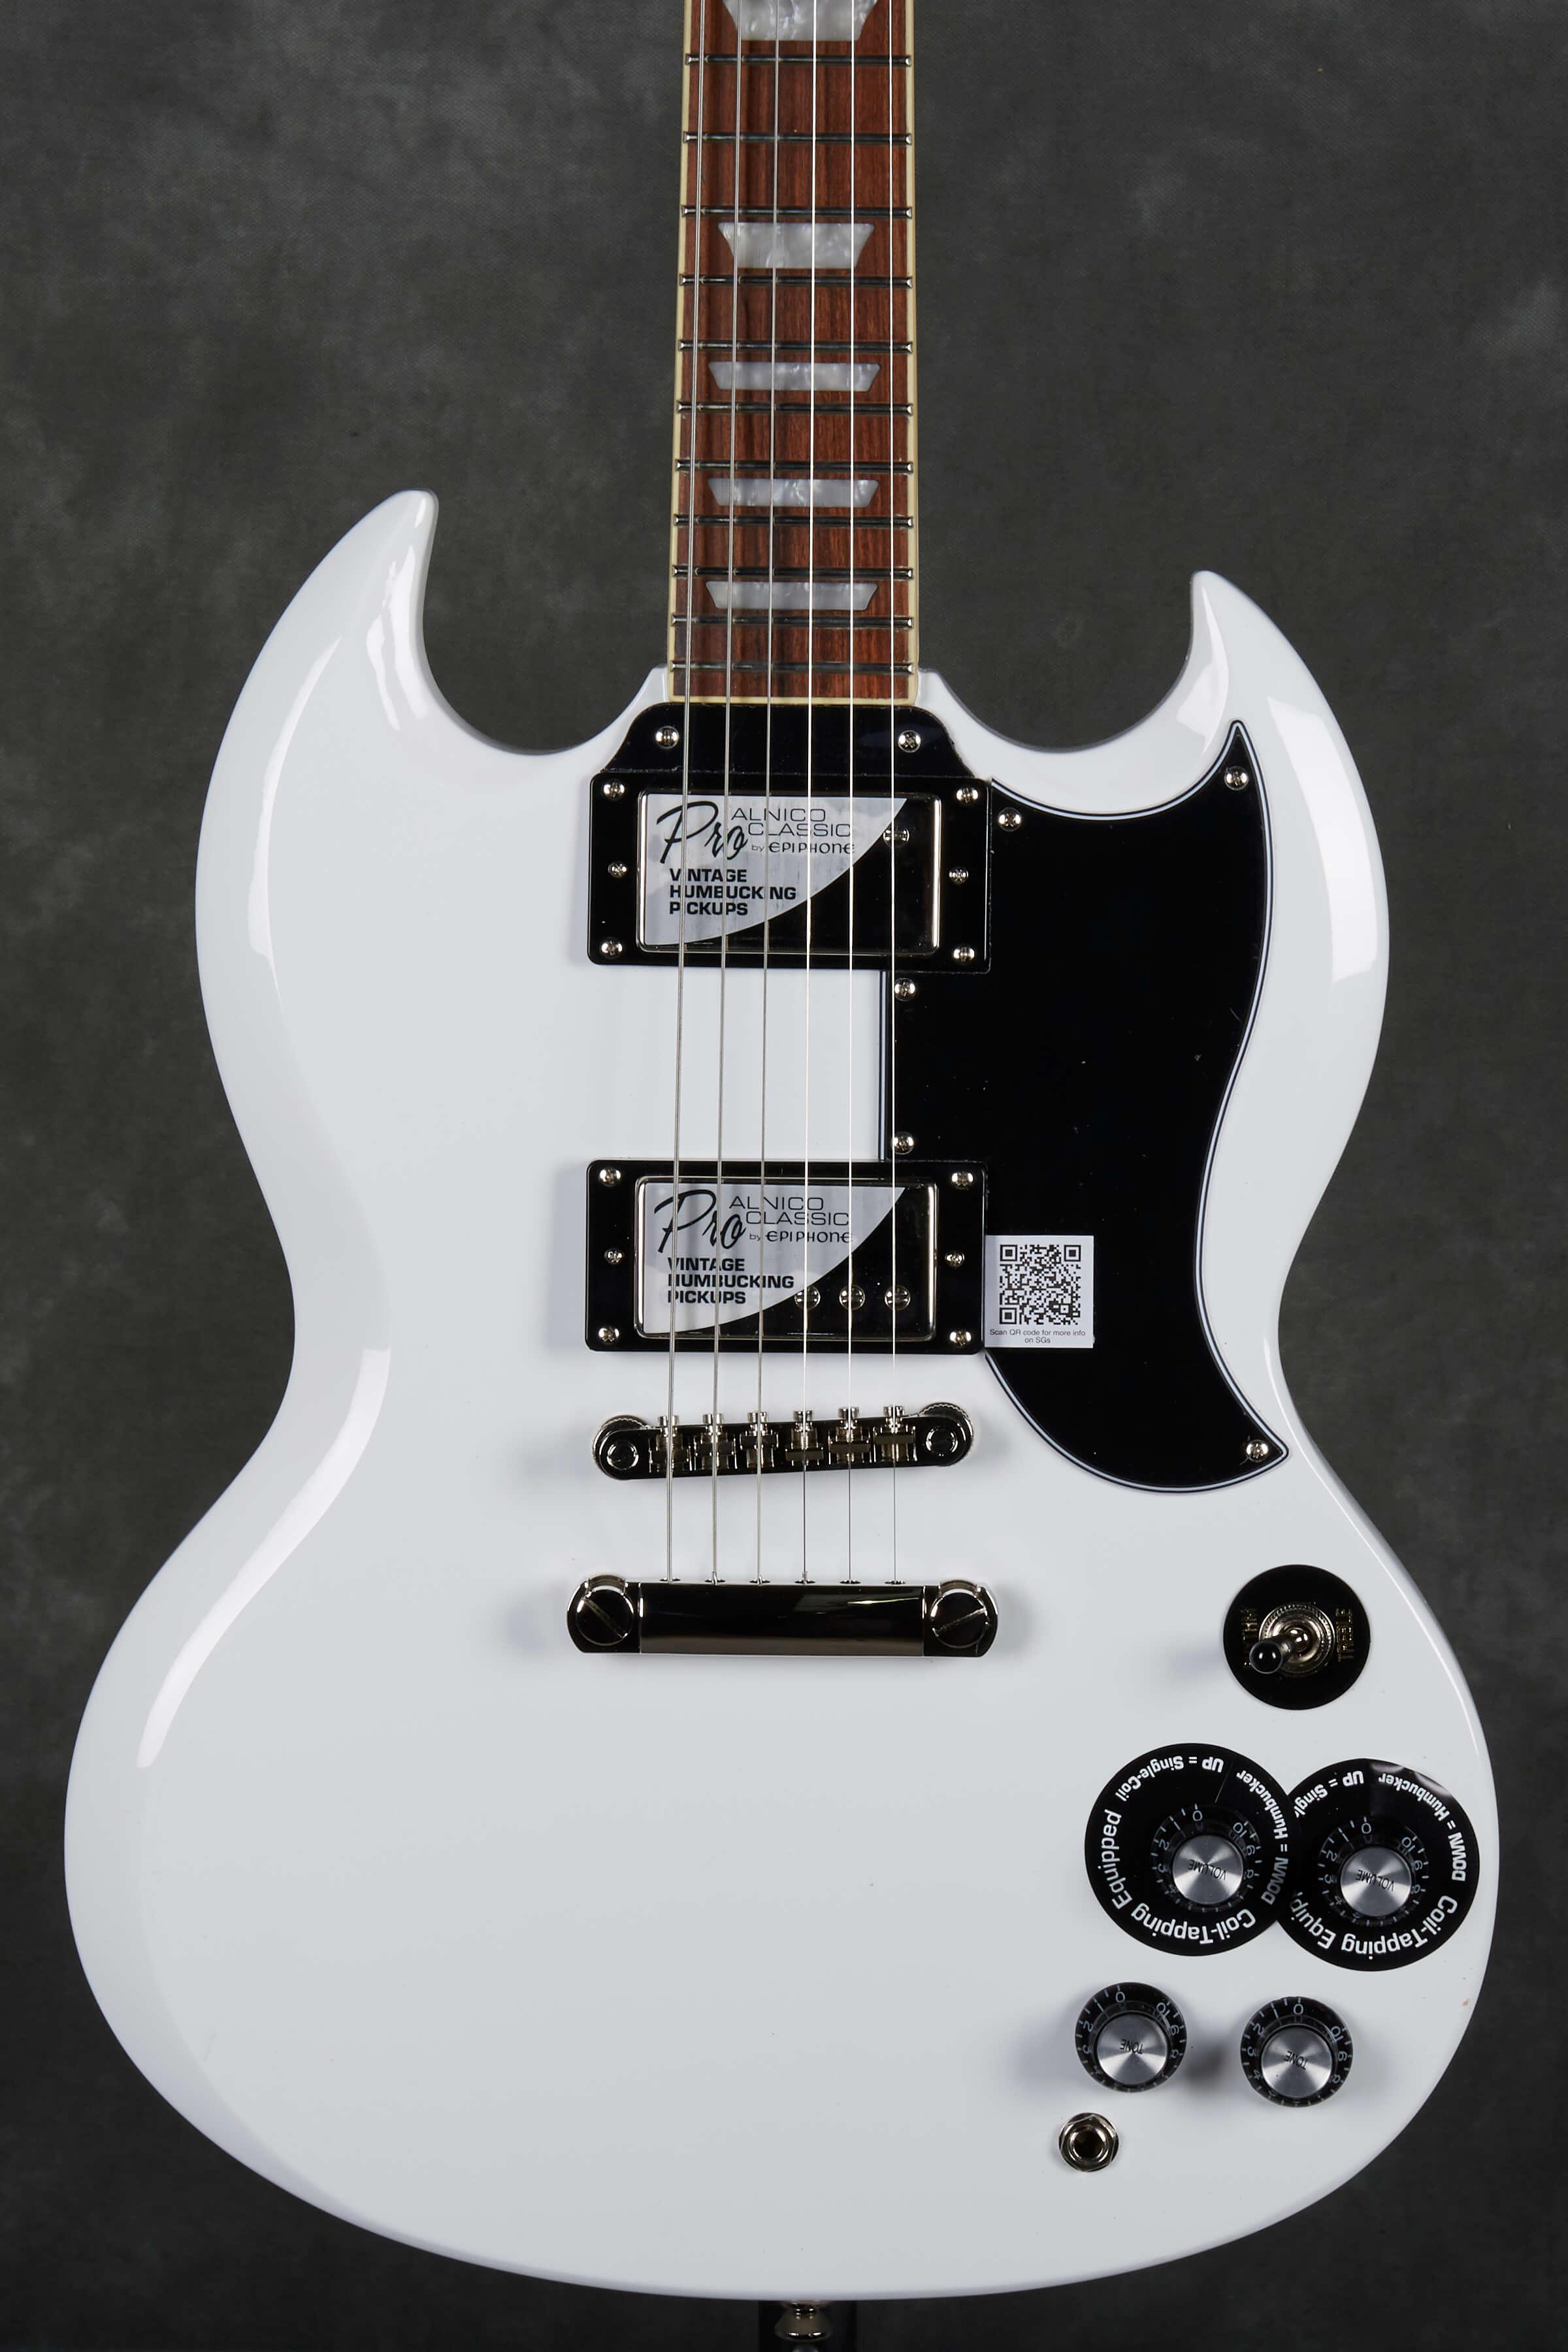 epiphone g 400 pro electric guitar alpine white rich tone music. Black Bedroom Furniture Sets. Home Design Ideas